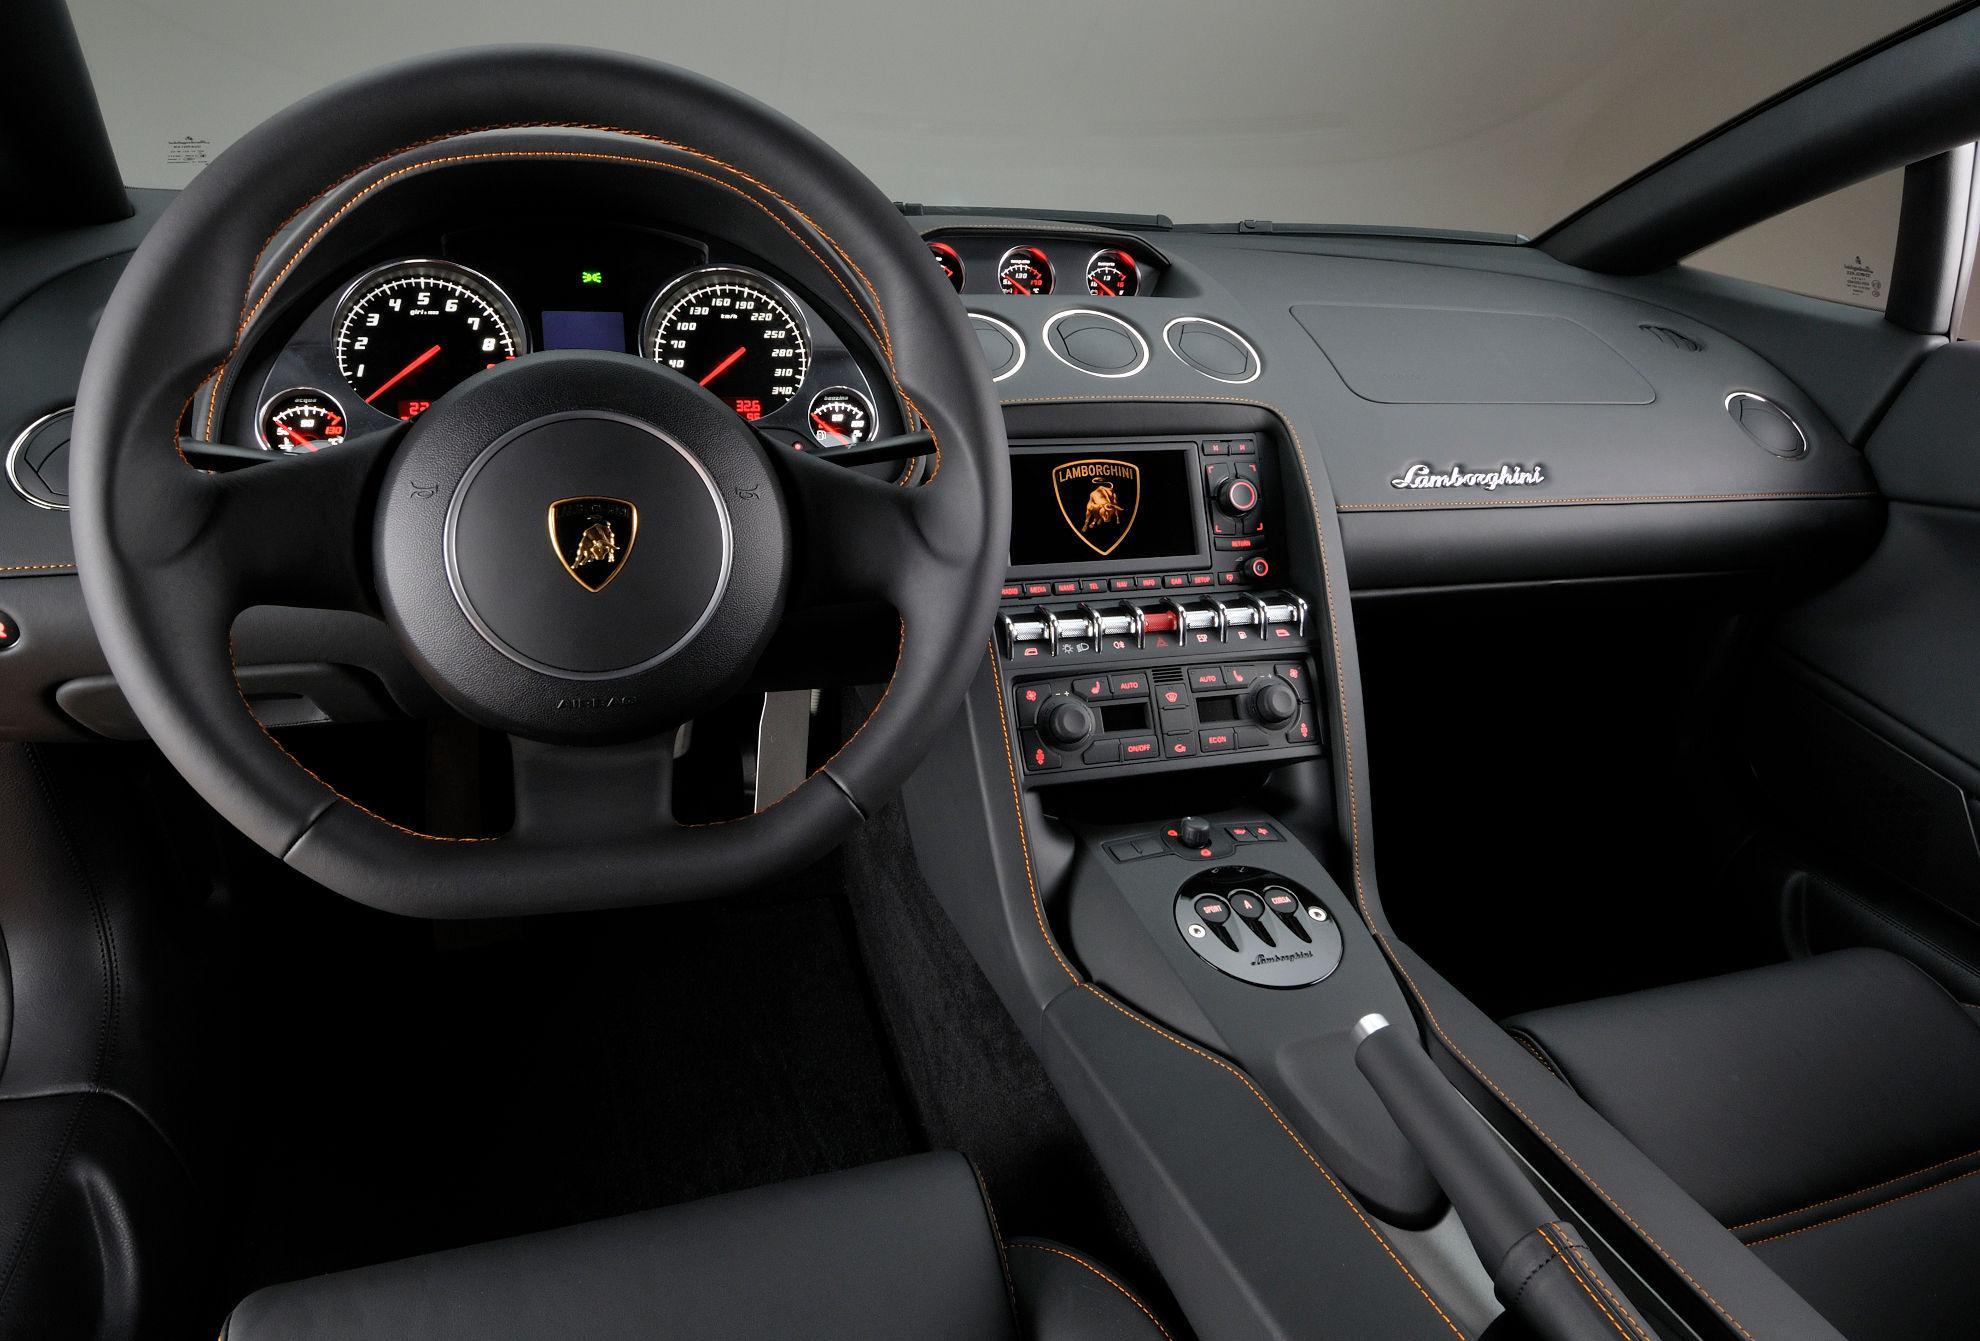 Lamborghini Gallardo-LP-560-4 Bicolore - Interieur